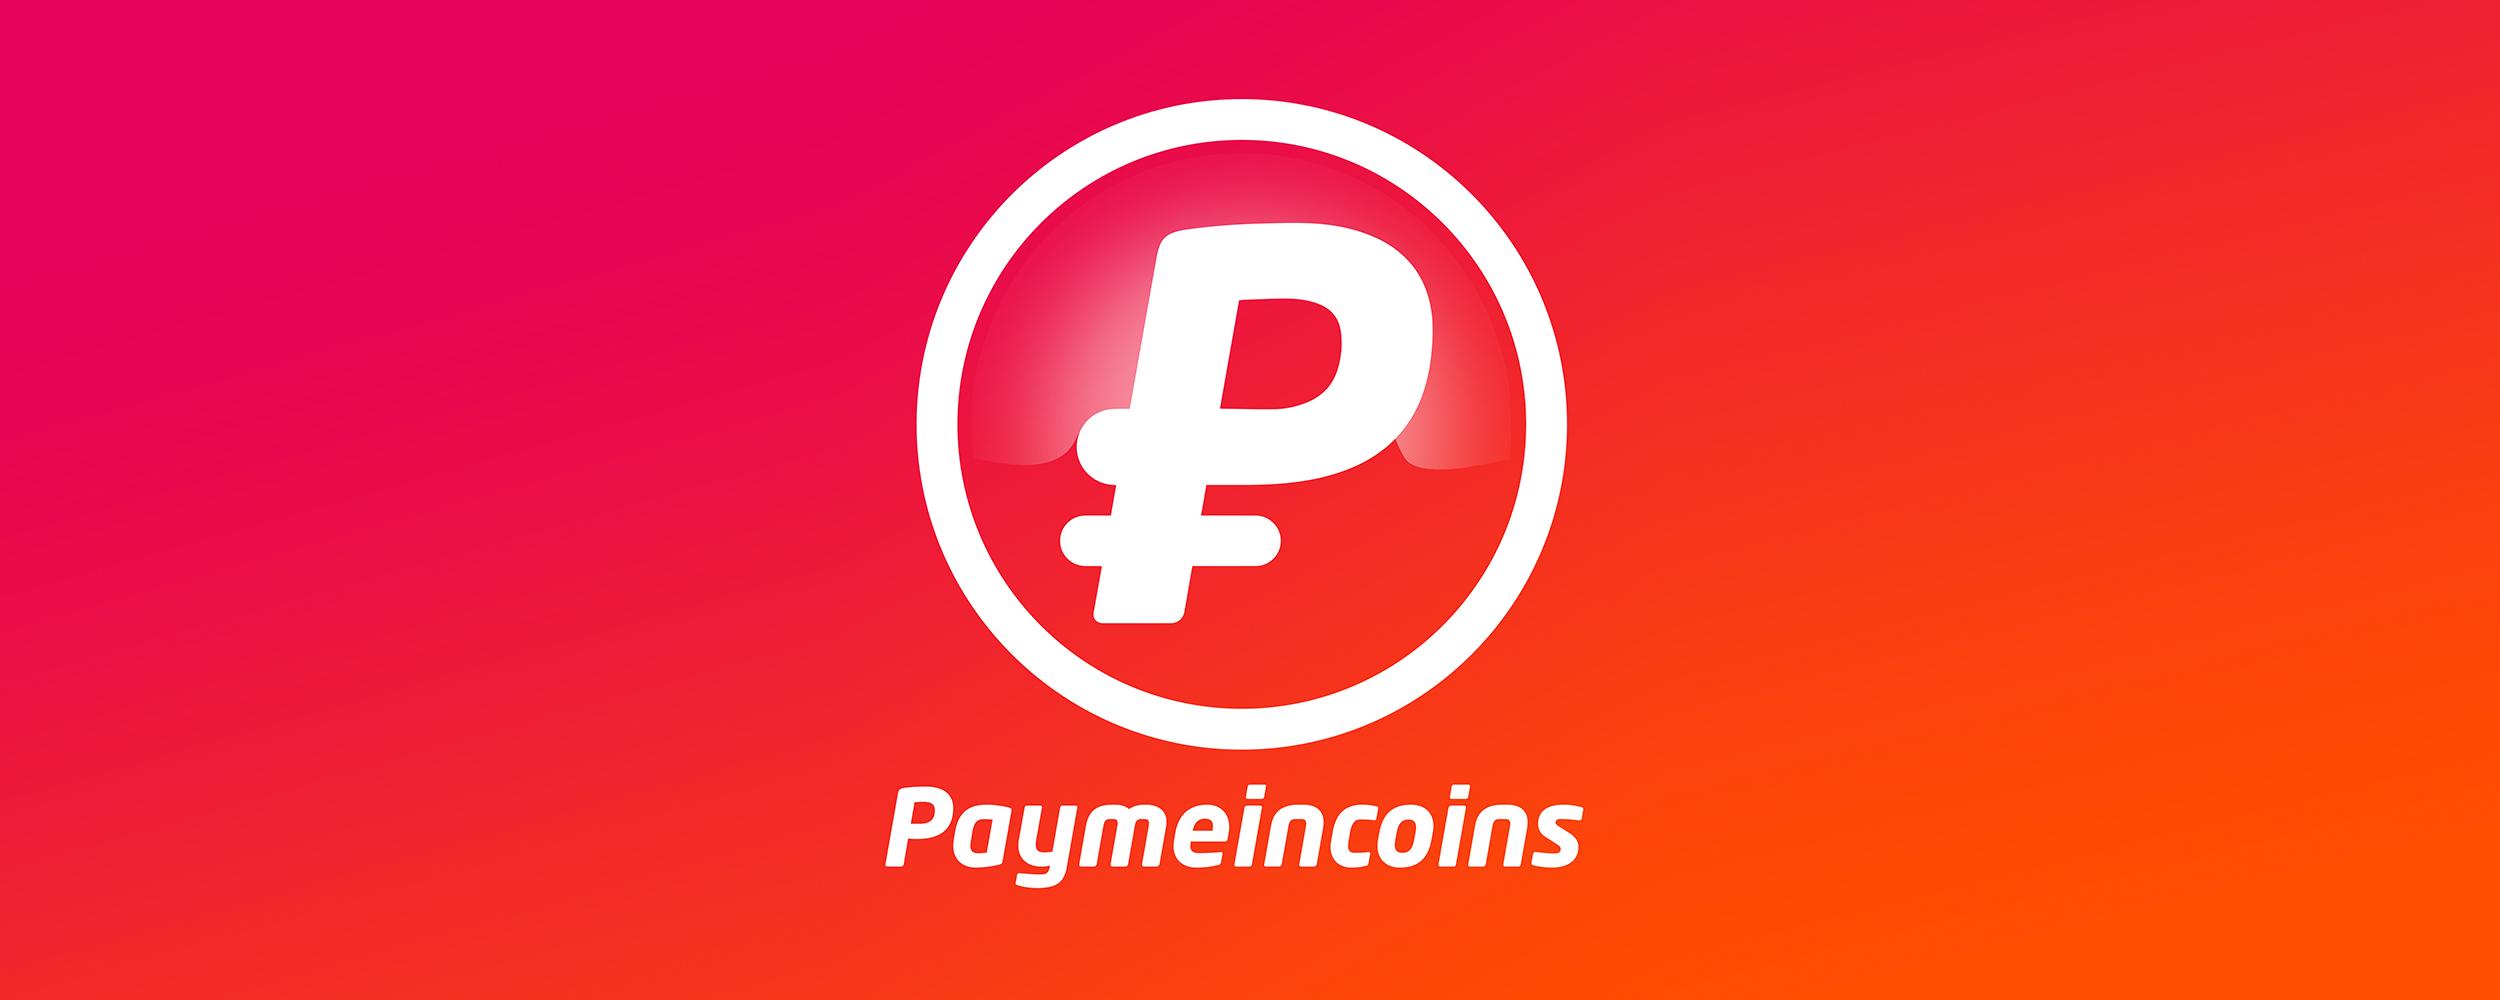 Paymeincoins2.1.jpg